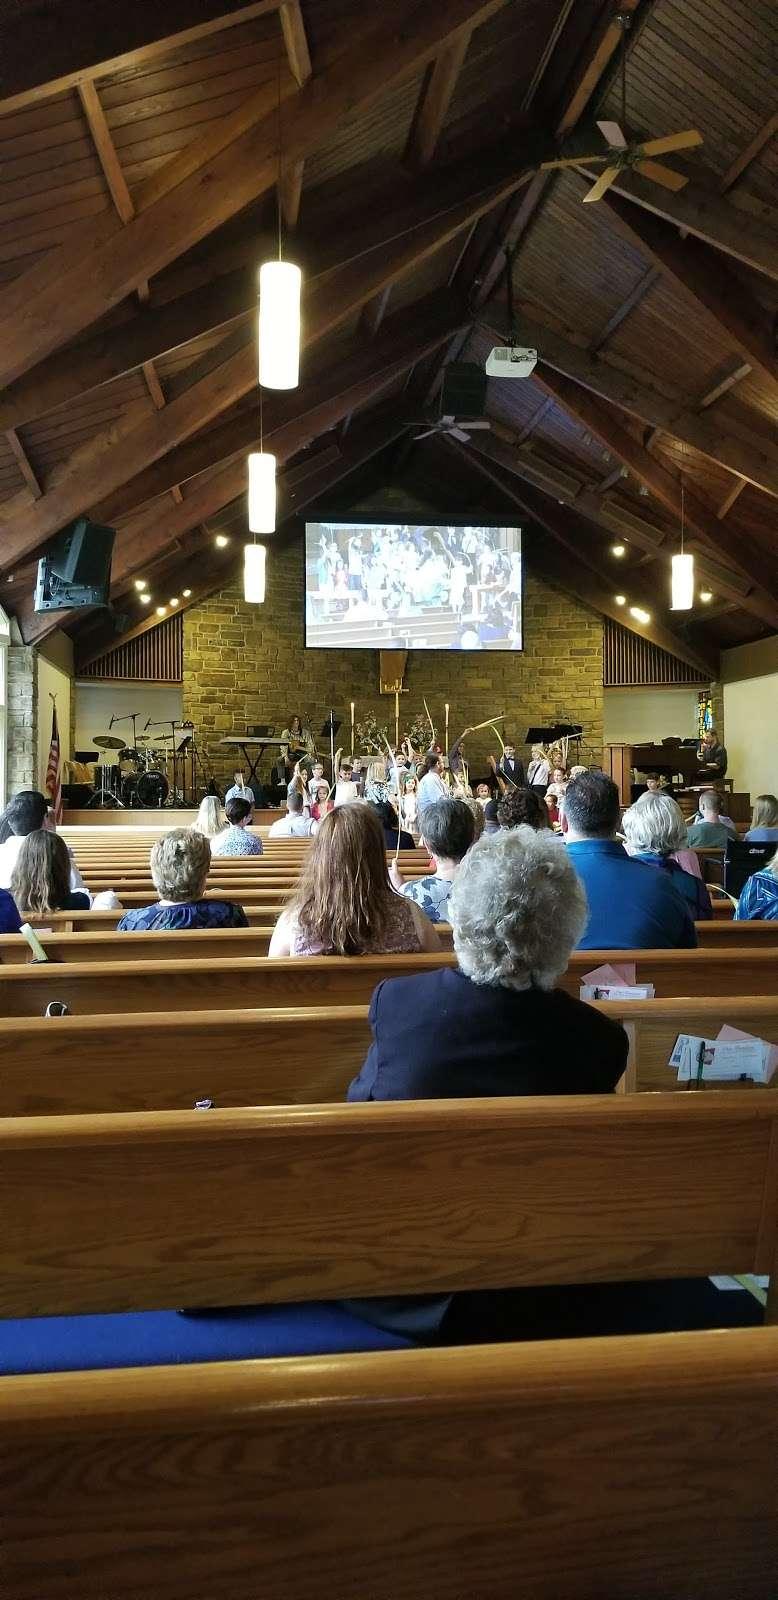 Gloria Dei Church - church  | Photo 8 of 10 | Address: 570 Welsh Rd, Huntingdon Valley, PA 19006, USA | Phone: (215) 947-8200